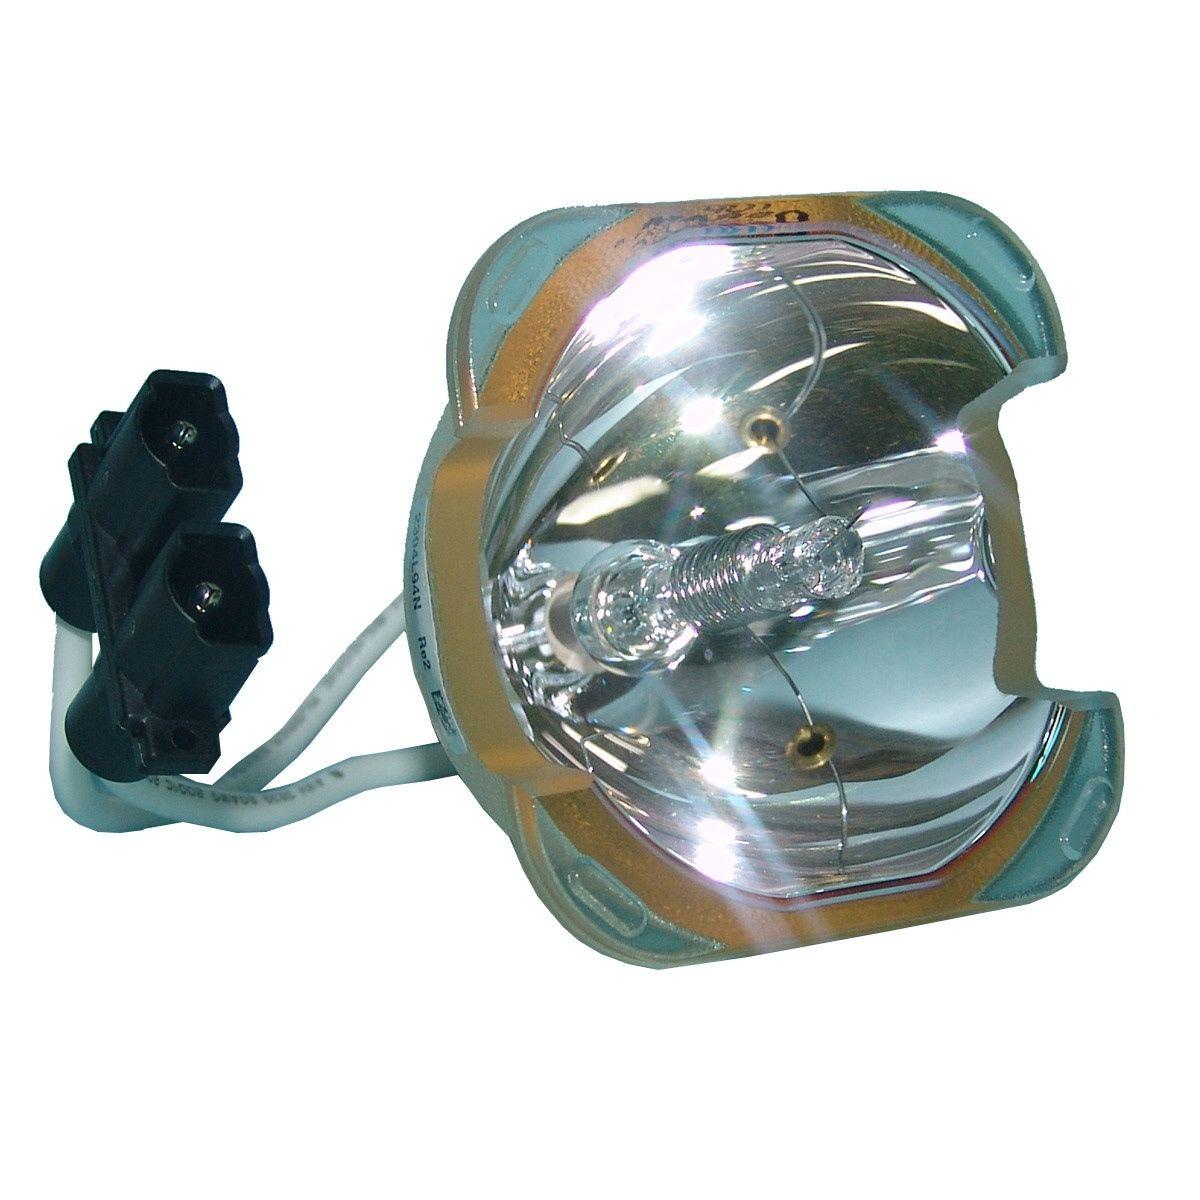 Compatible Bare Bulb 60.J3503.CB1 for BenQ DS760 PB8120 PB8220 PB8230 DX760 Projector Lamp Bulb without housing 60 j3503 cb1 compatible bare lamp with housing for benq ds760 dx760 pb8100 pb8120 pb8210 pb8220 pb8230 projectors